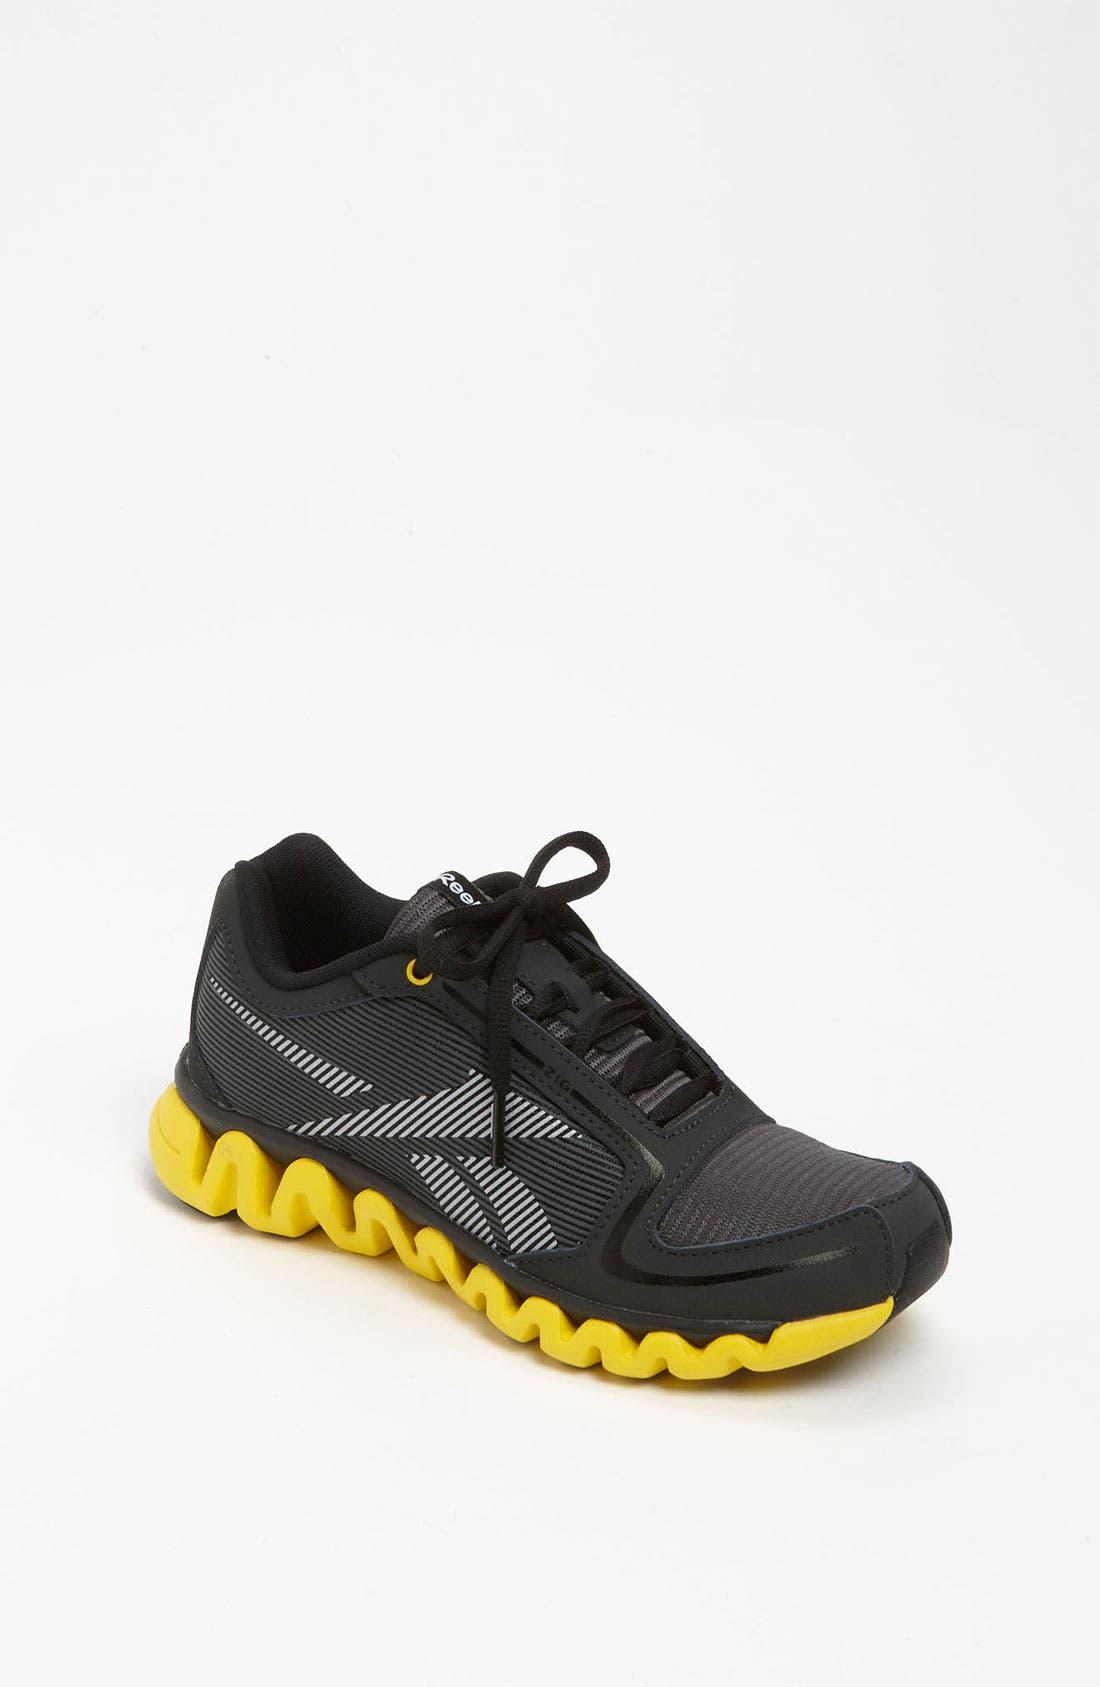 Main Image - Reebok 'ZigLite Run' Sneaker (Toddler, Little Kid & Big Kid)